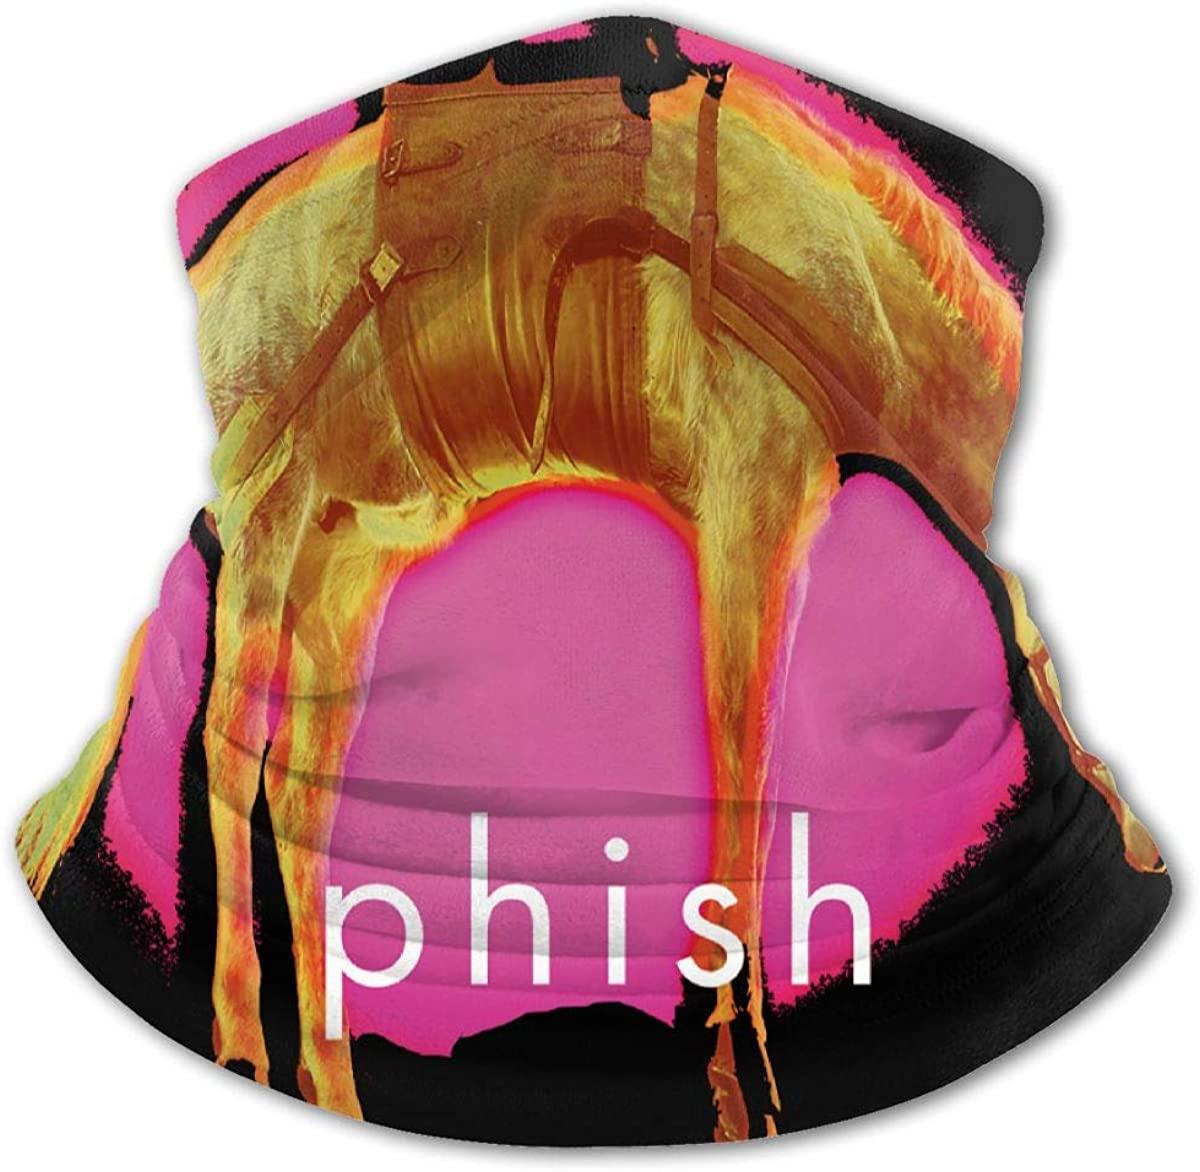 Phish Face Mask Bandanas,Neck Gaiter,Headwear,Magic Scarf,Headband for Dust Sun Wind,Reusable Bandana Face Cover Black